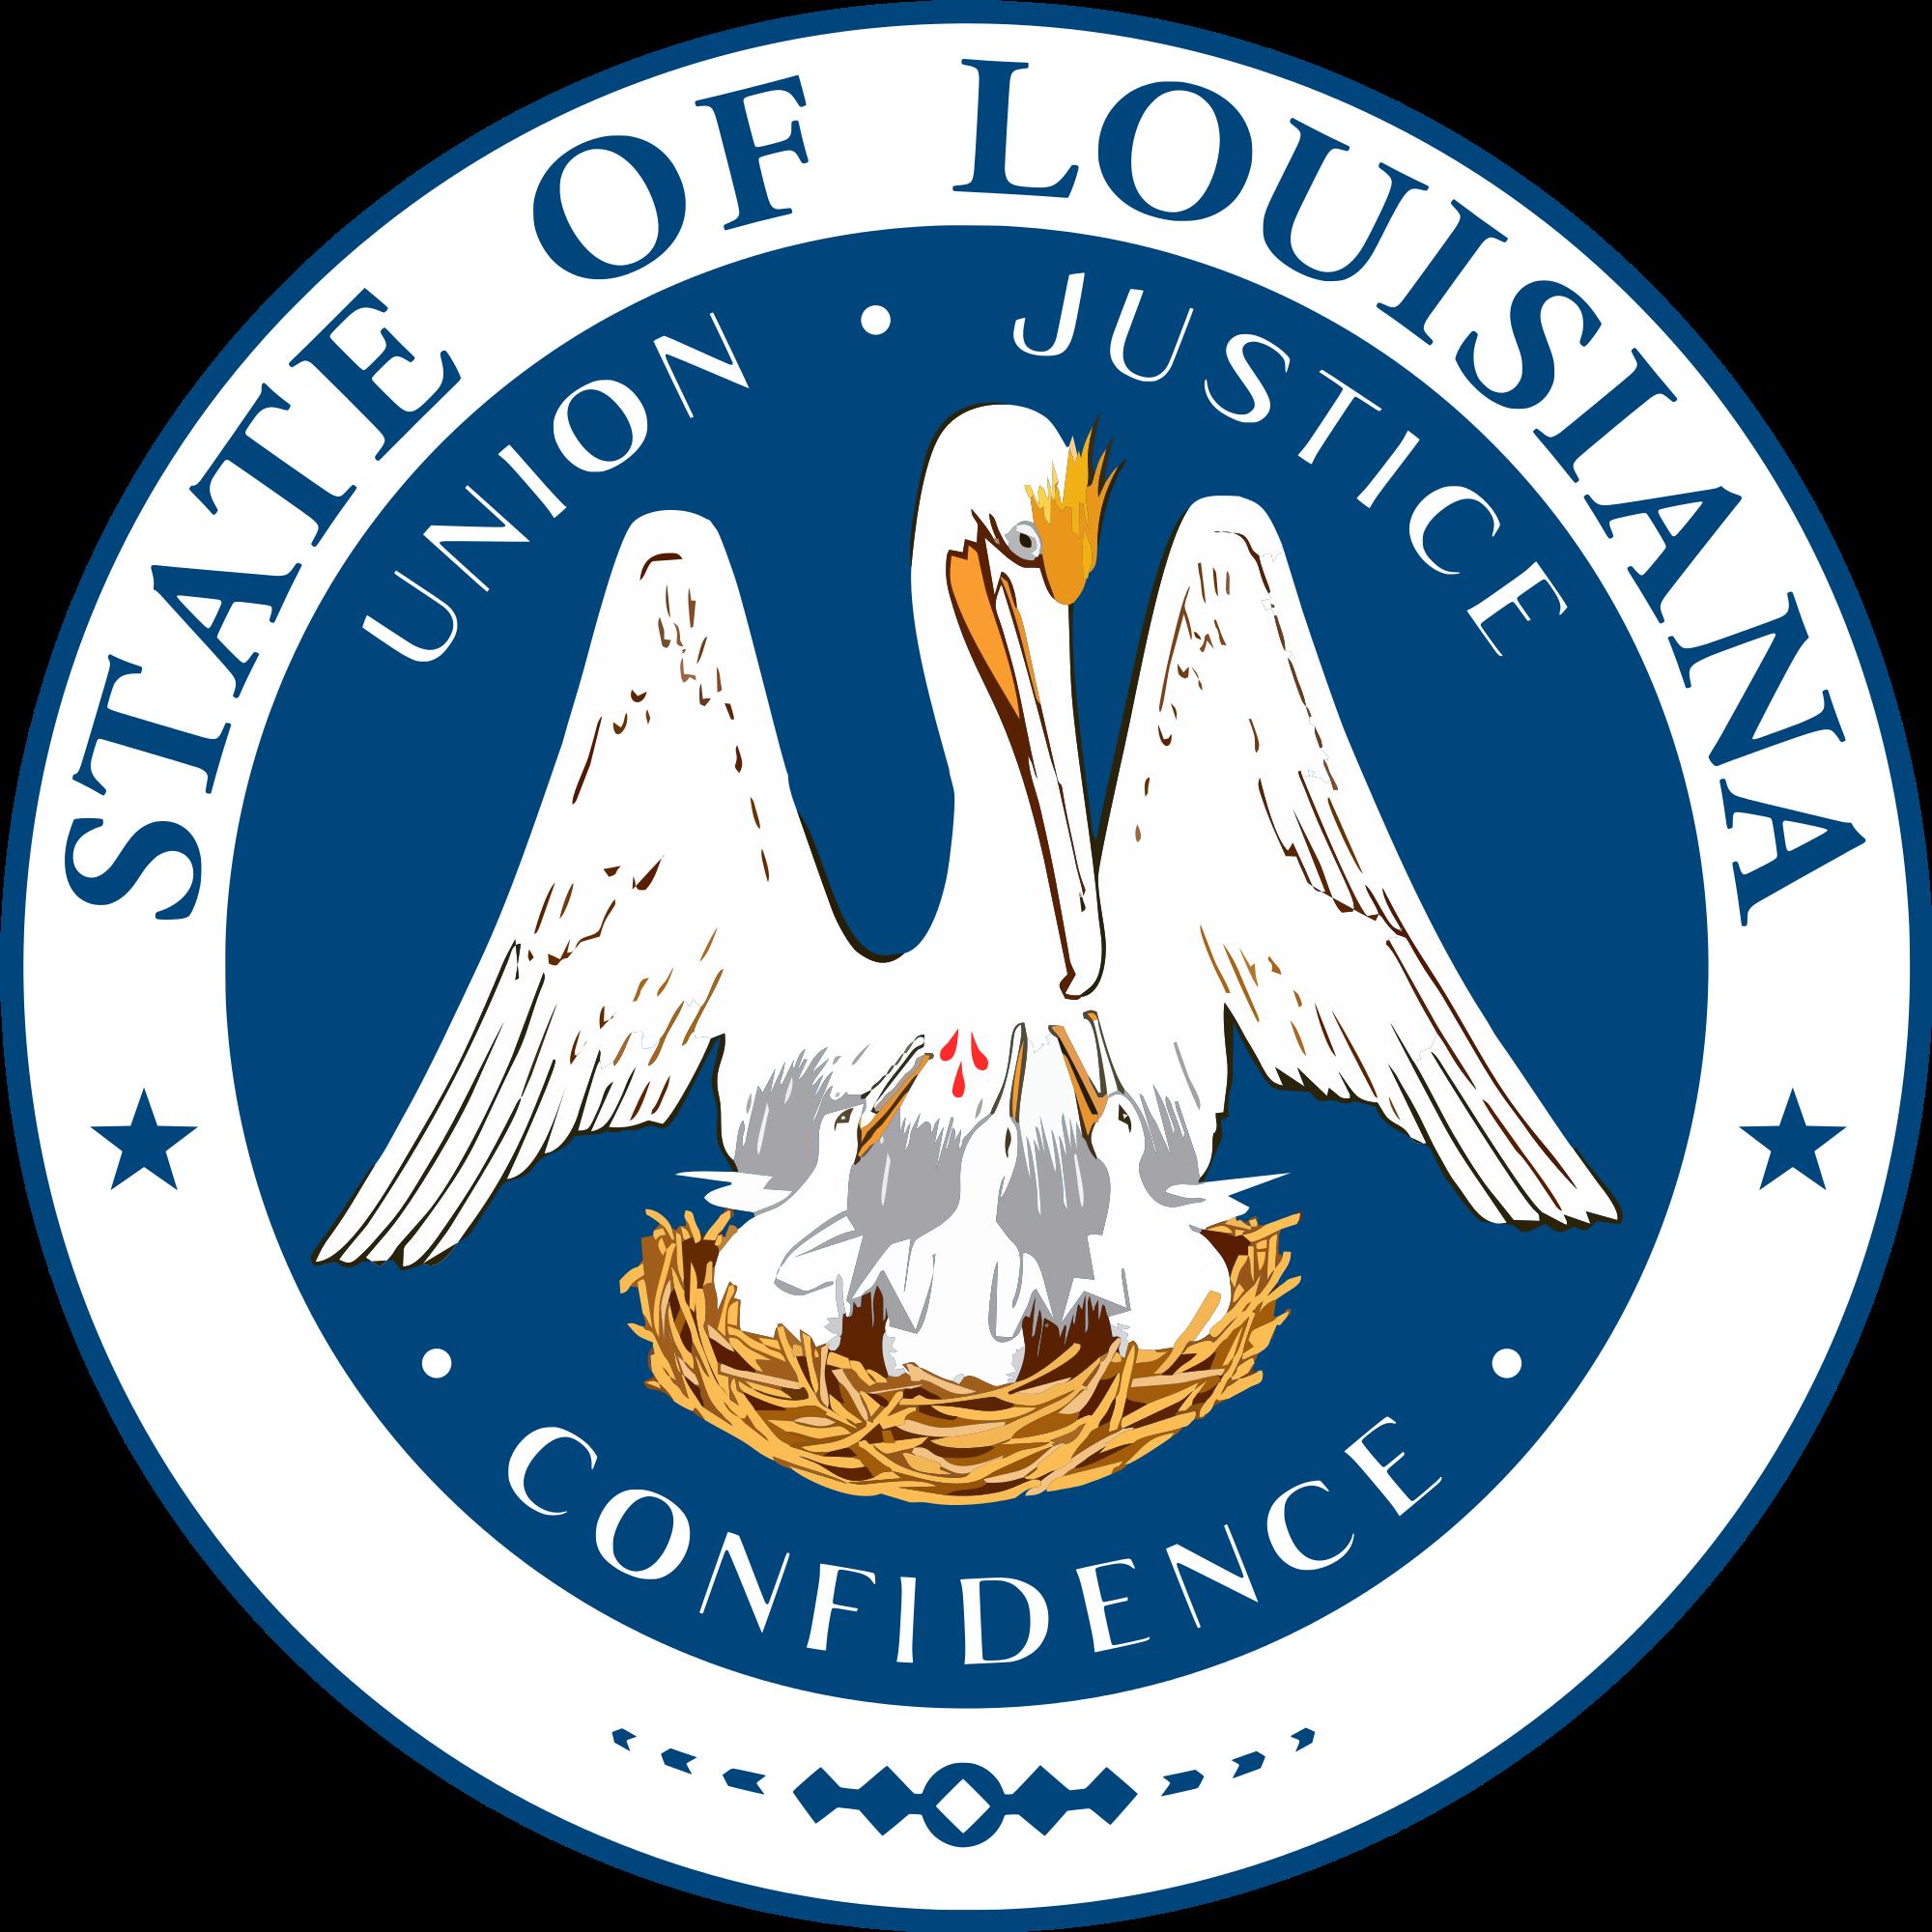 Crawfish clipart symbol louisiana. List of state symbols